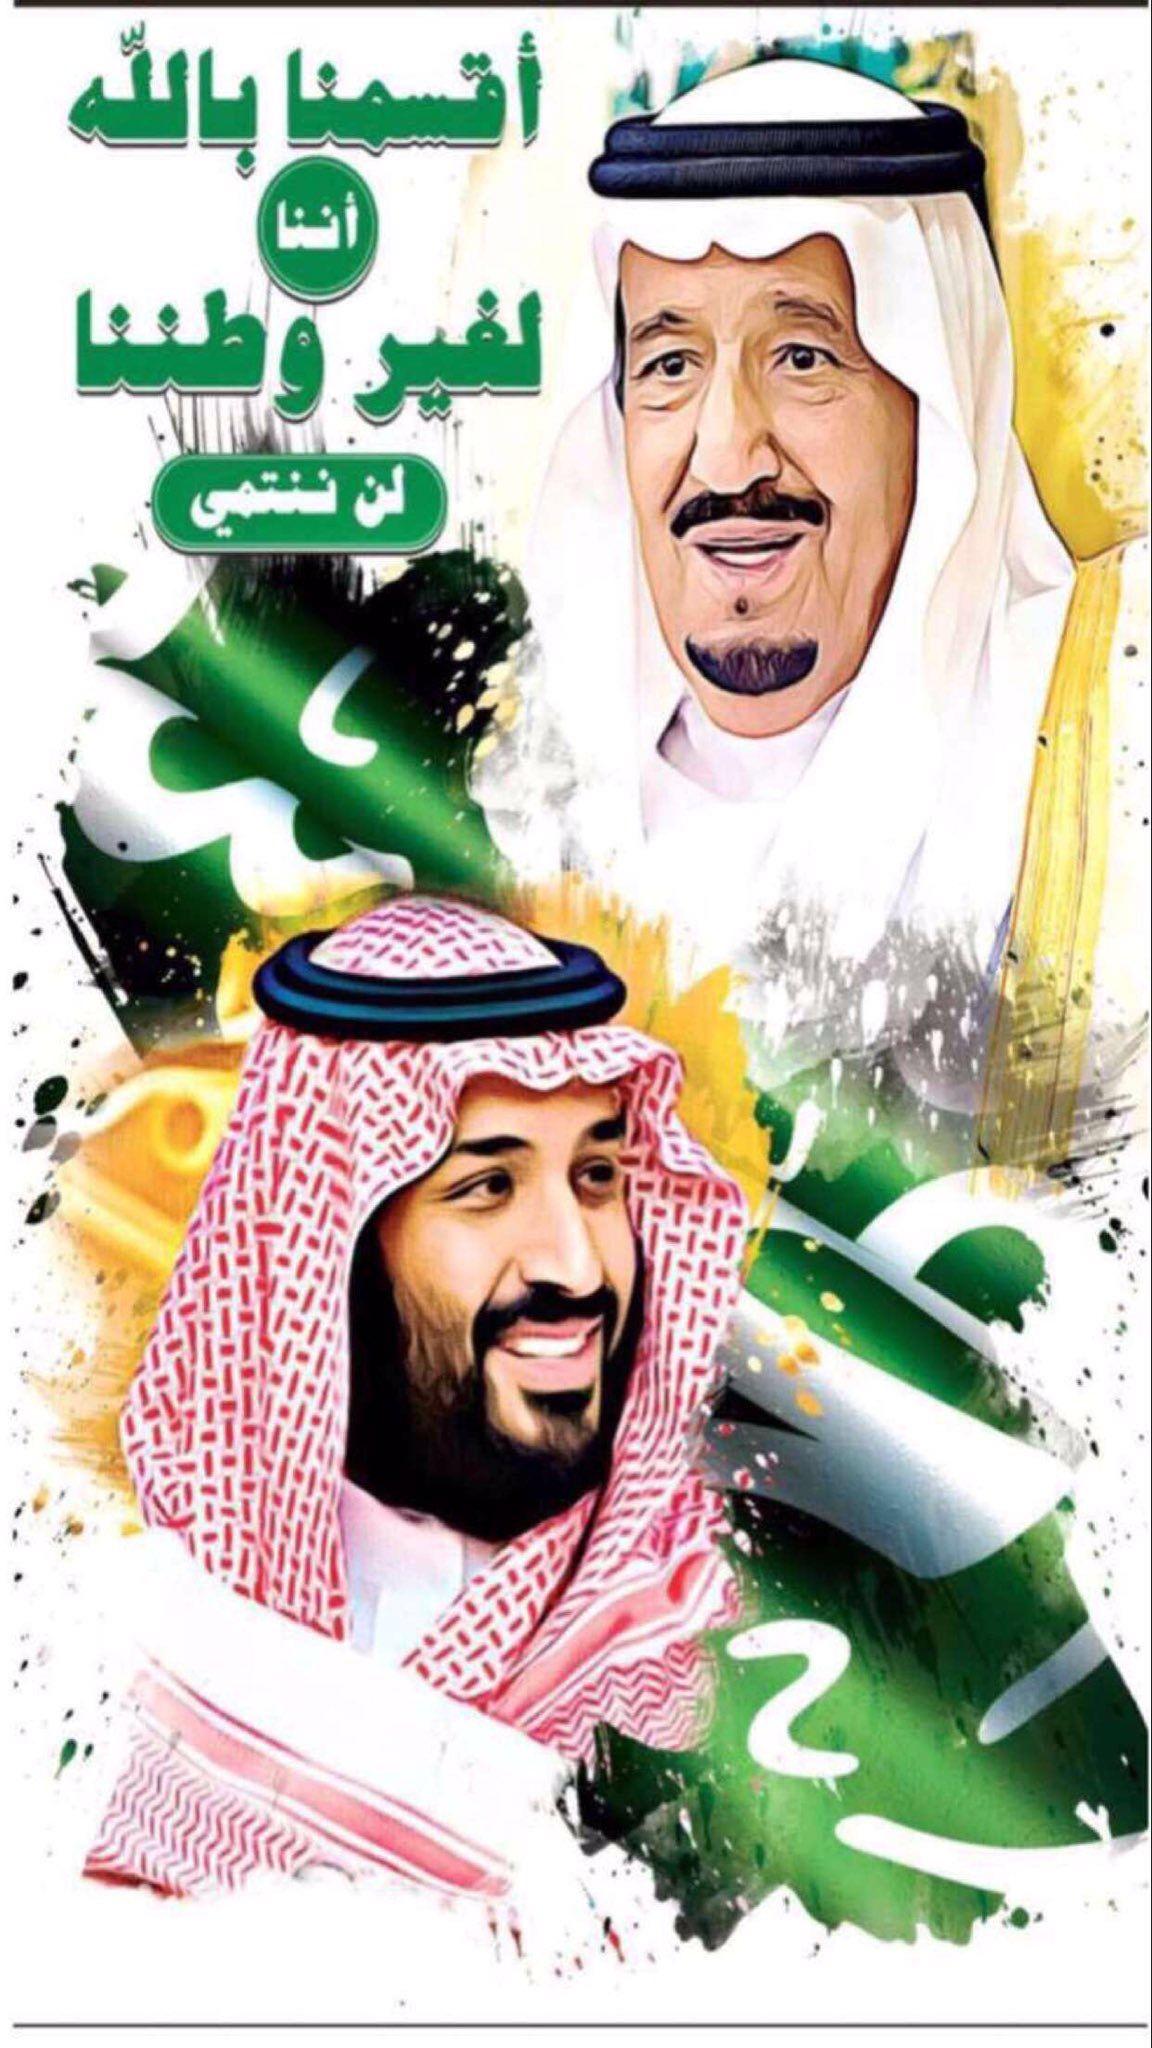 Pin By Msurme74 On الملك سلمان بن عبدالعزيز ال سعود وولي العهد سمو الامير محمد بن سلمان حفظهما الله National Day Saudi National Day Artist